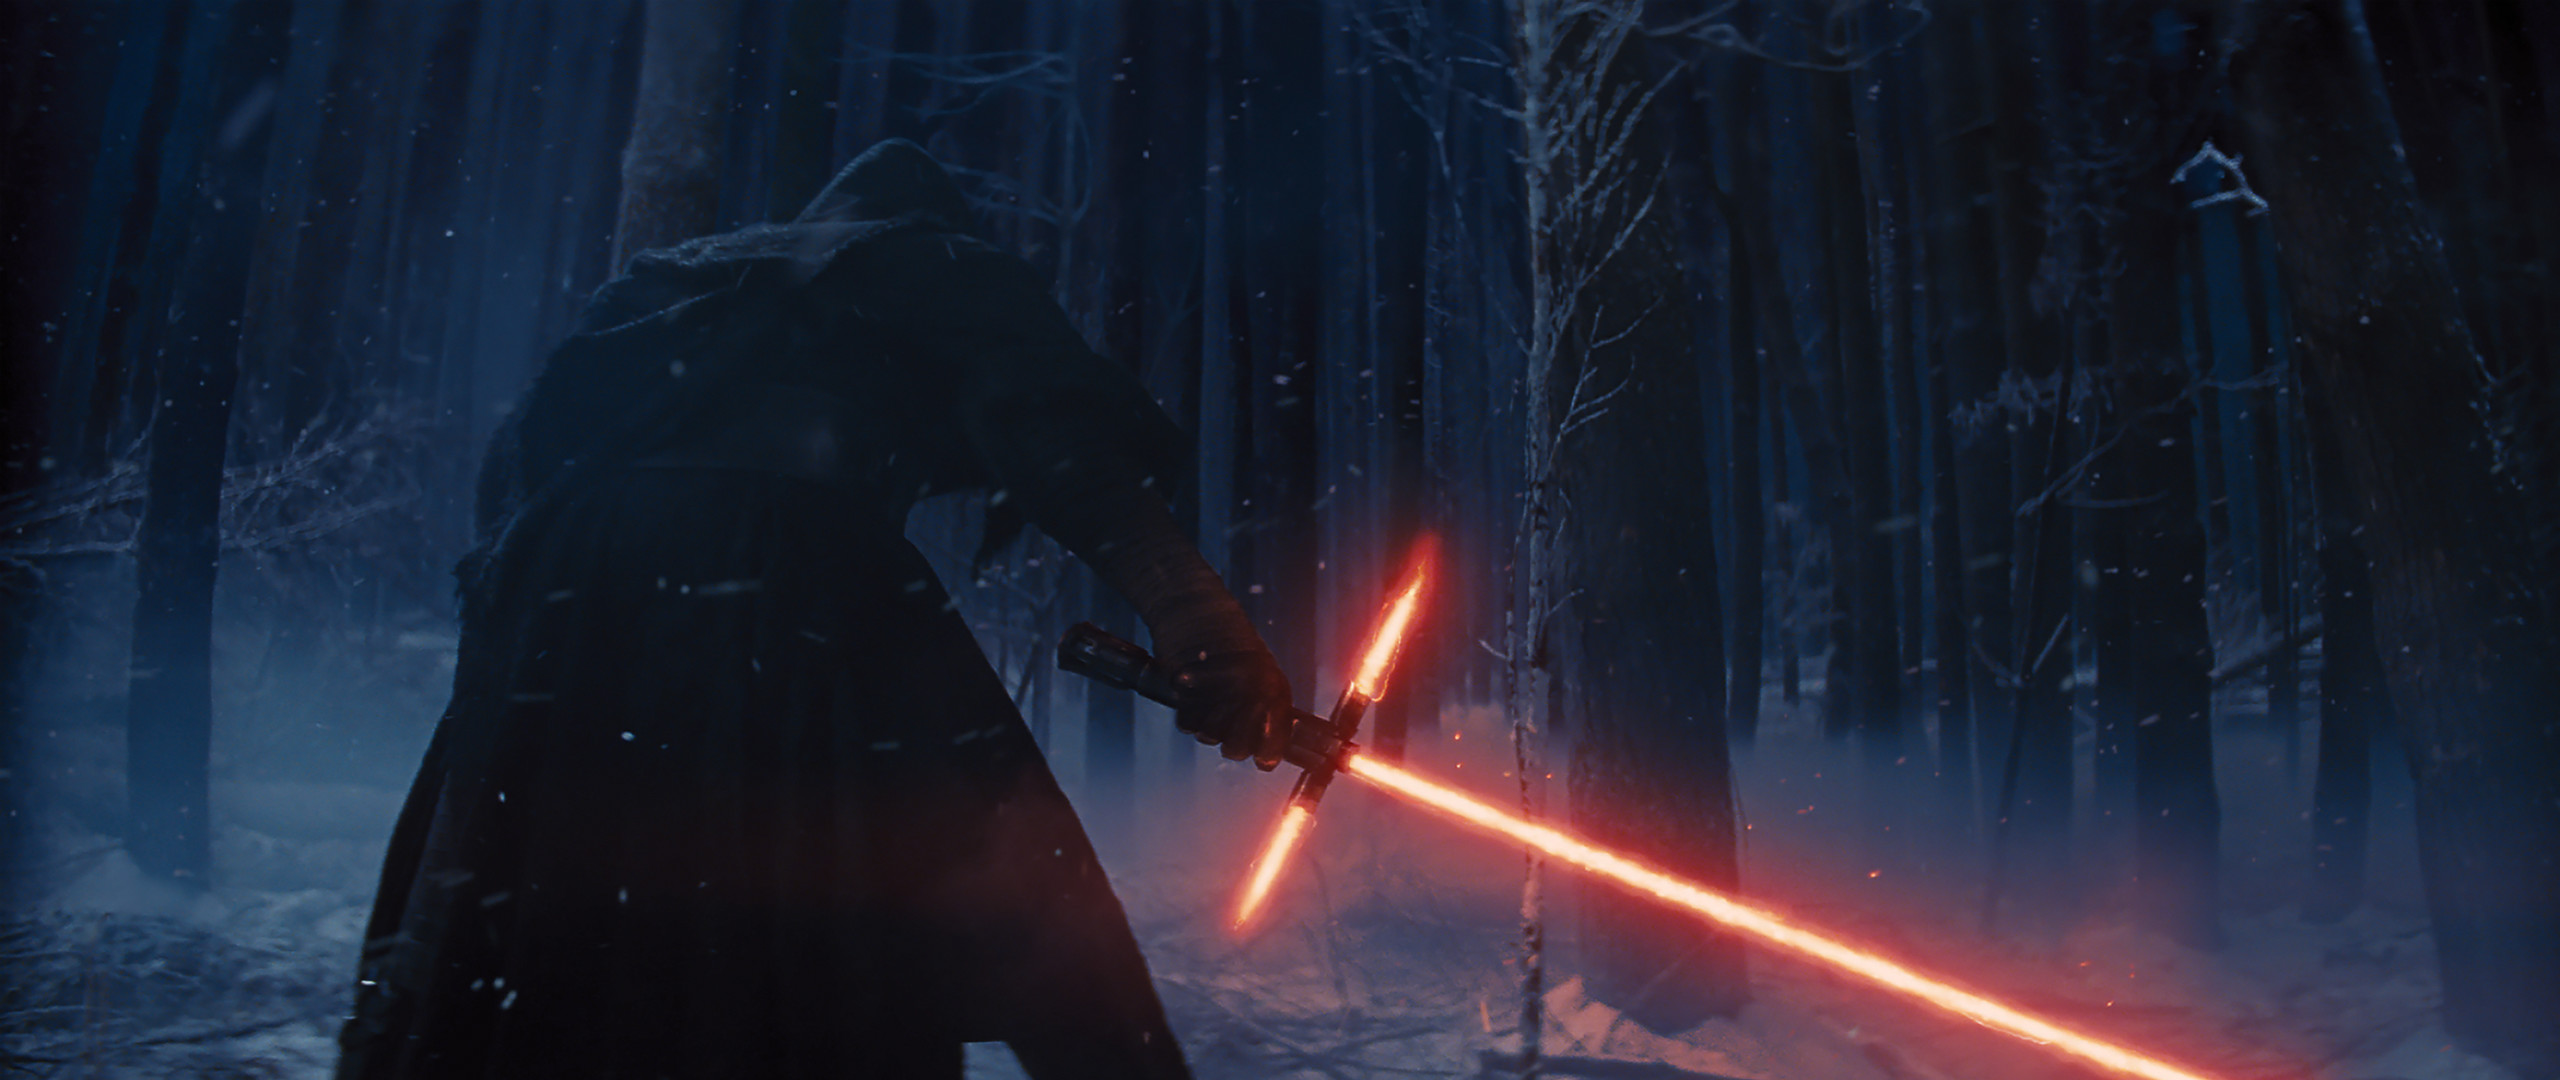 General Star Wars: The Force Awakens Kylo Ren